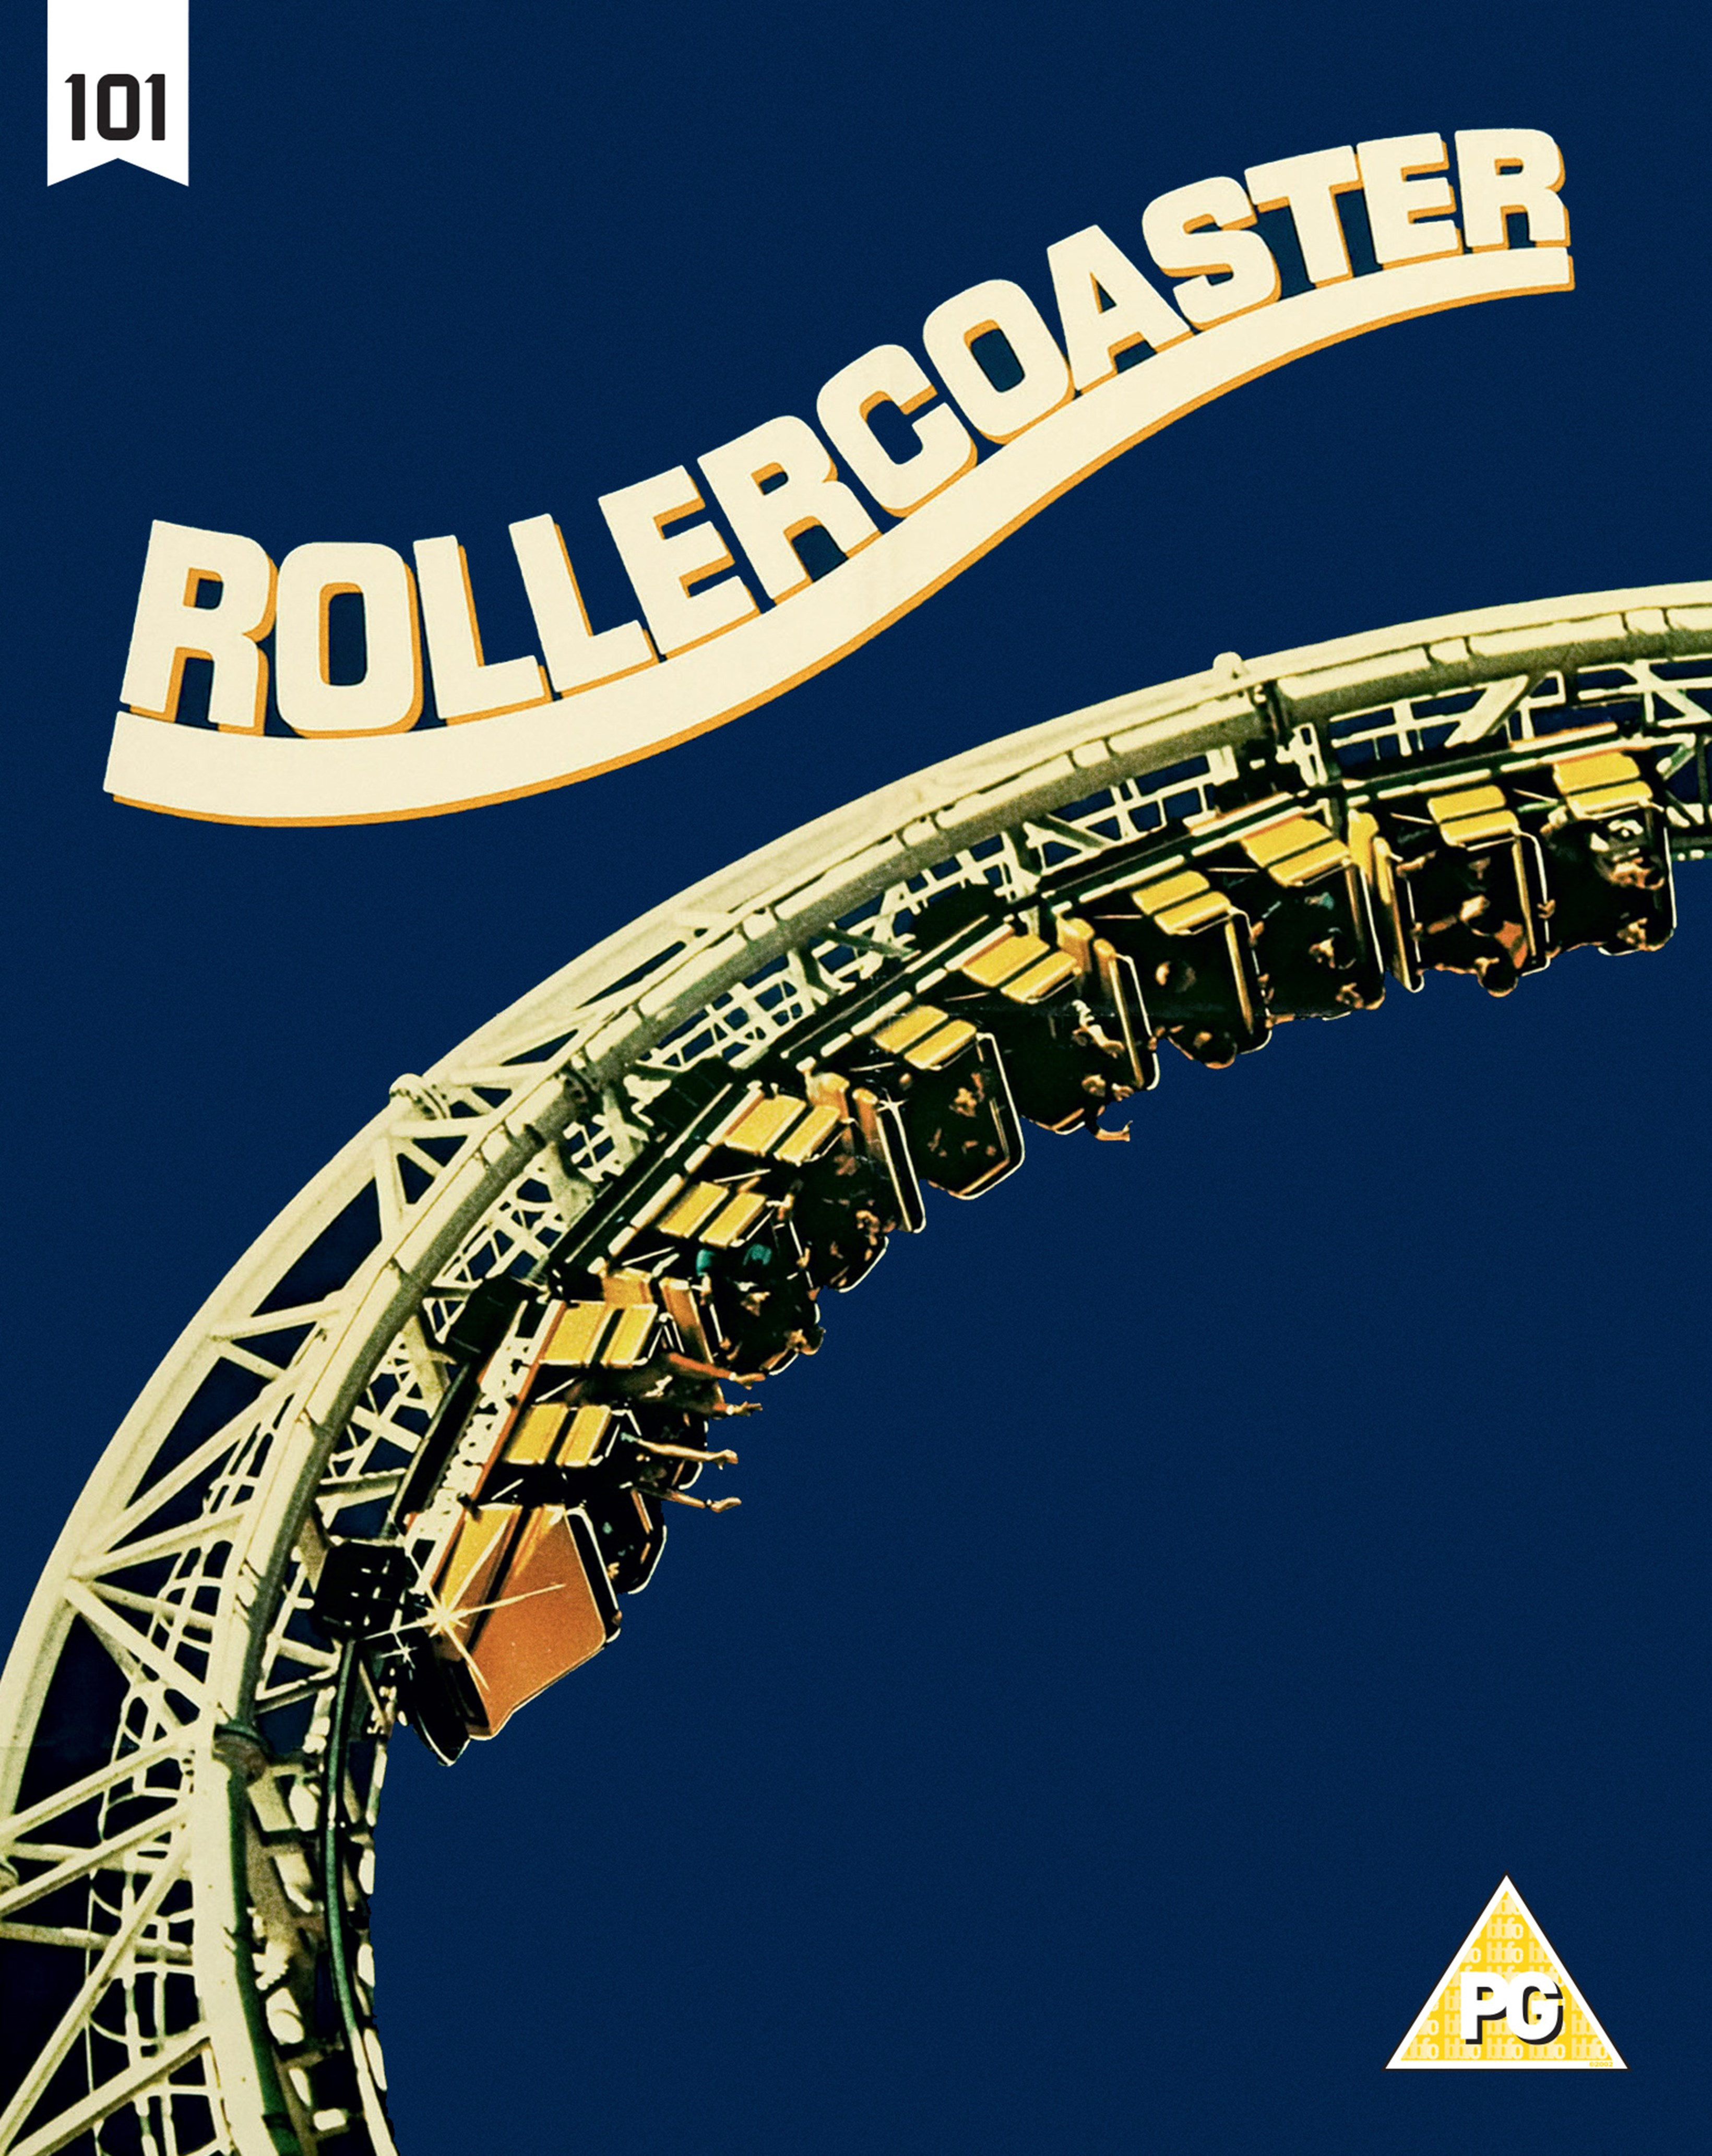 Rollercoaster - 1